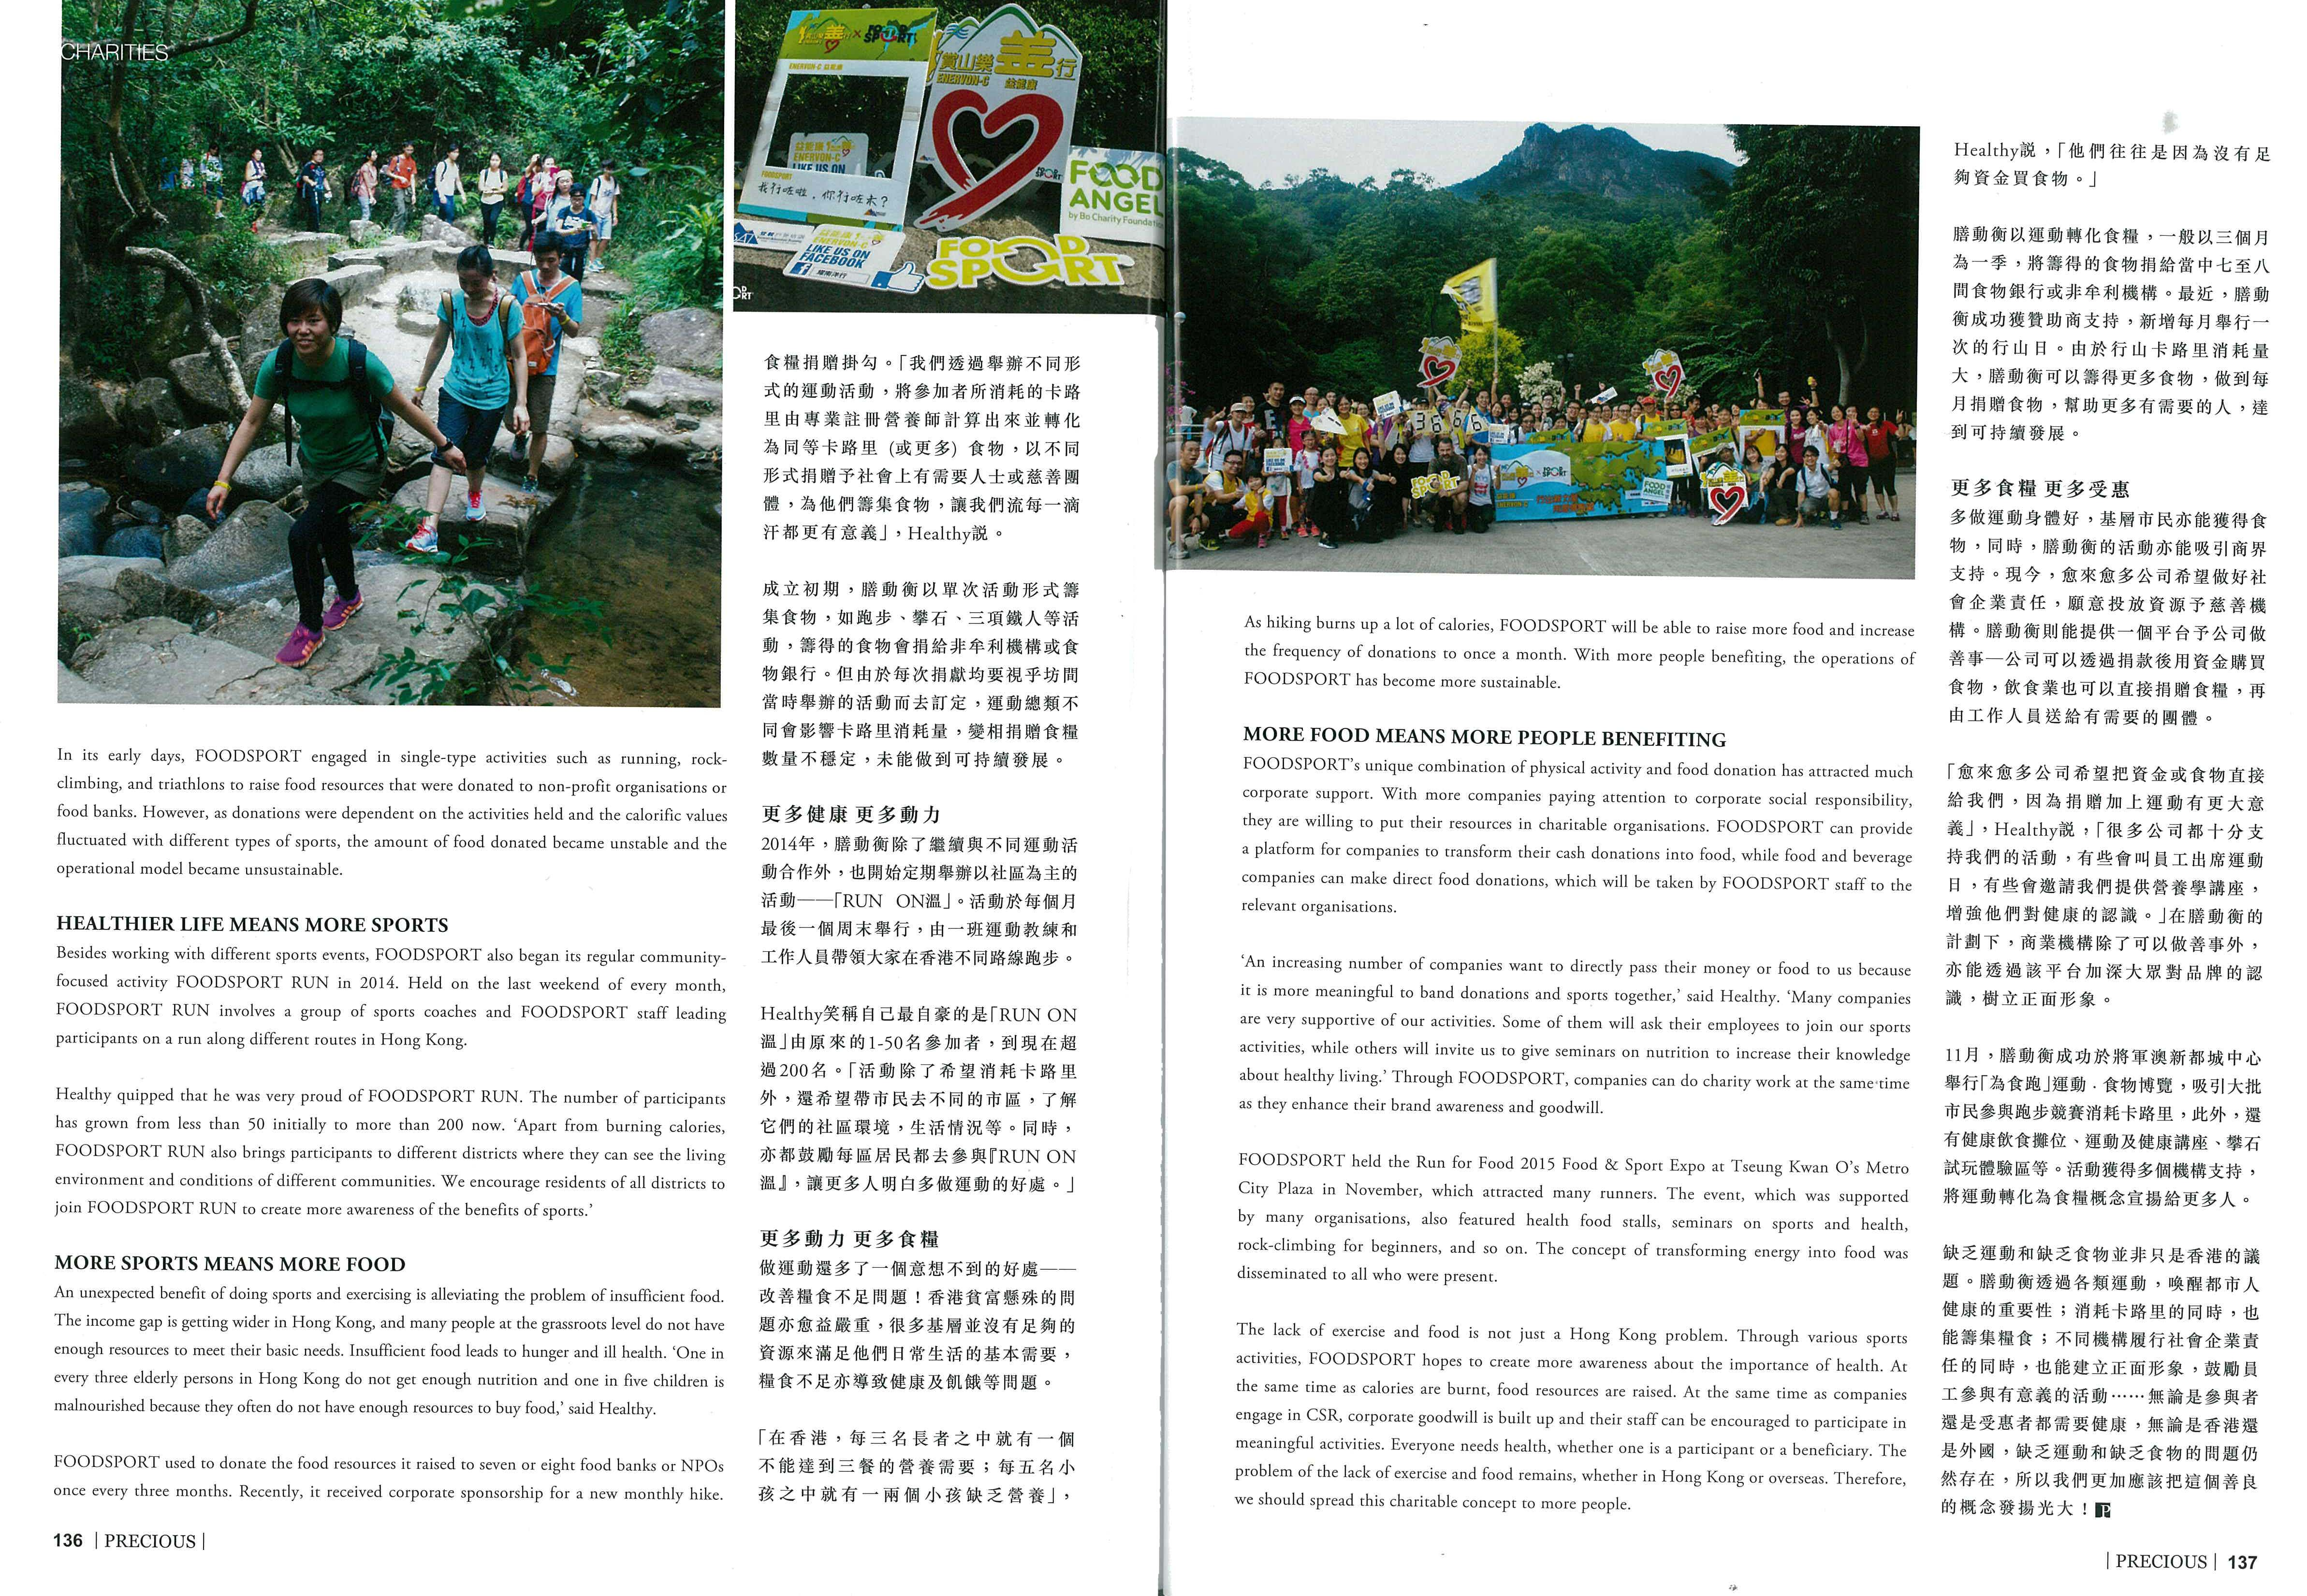 品尊 Precious Magazine 2